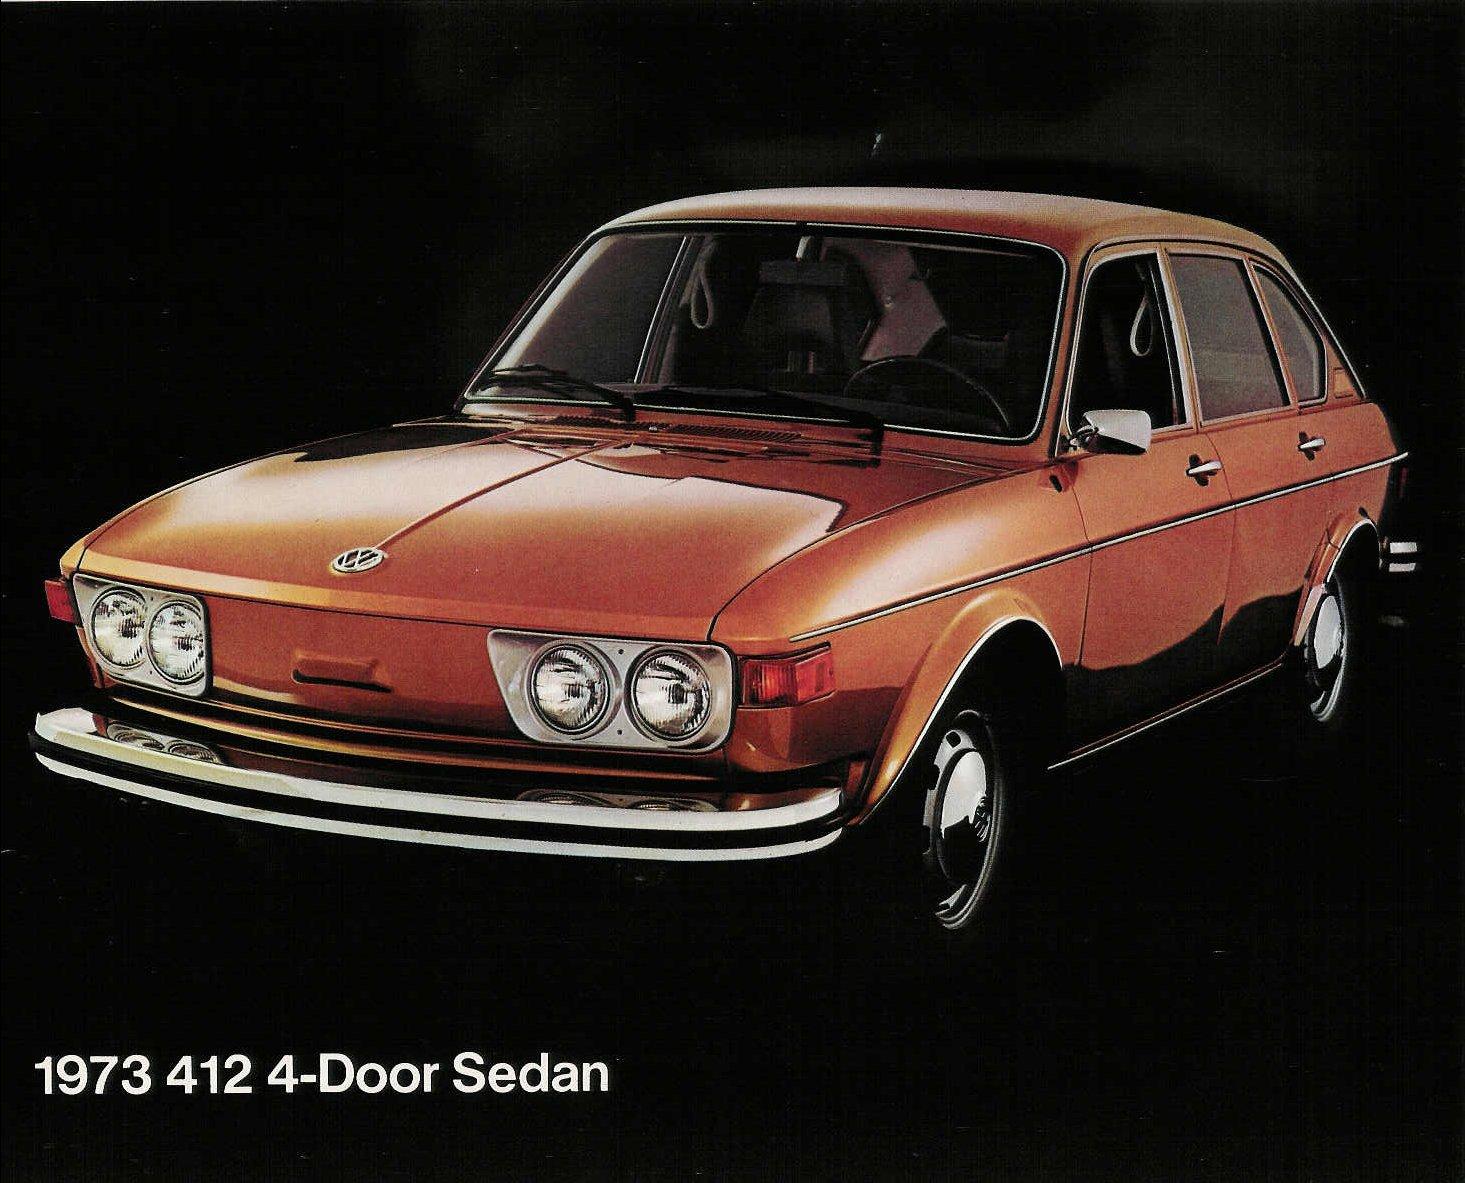 TheSamba.com :: VW Archives - 1973 US Color sheet - VW 412 4-door sedan